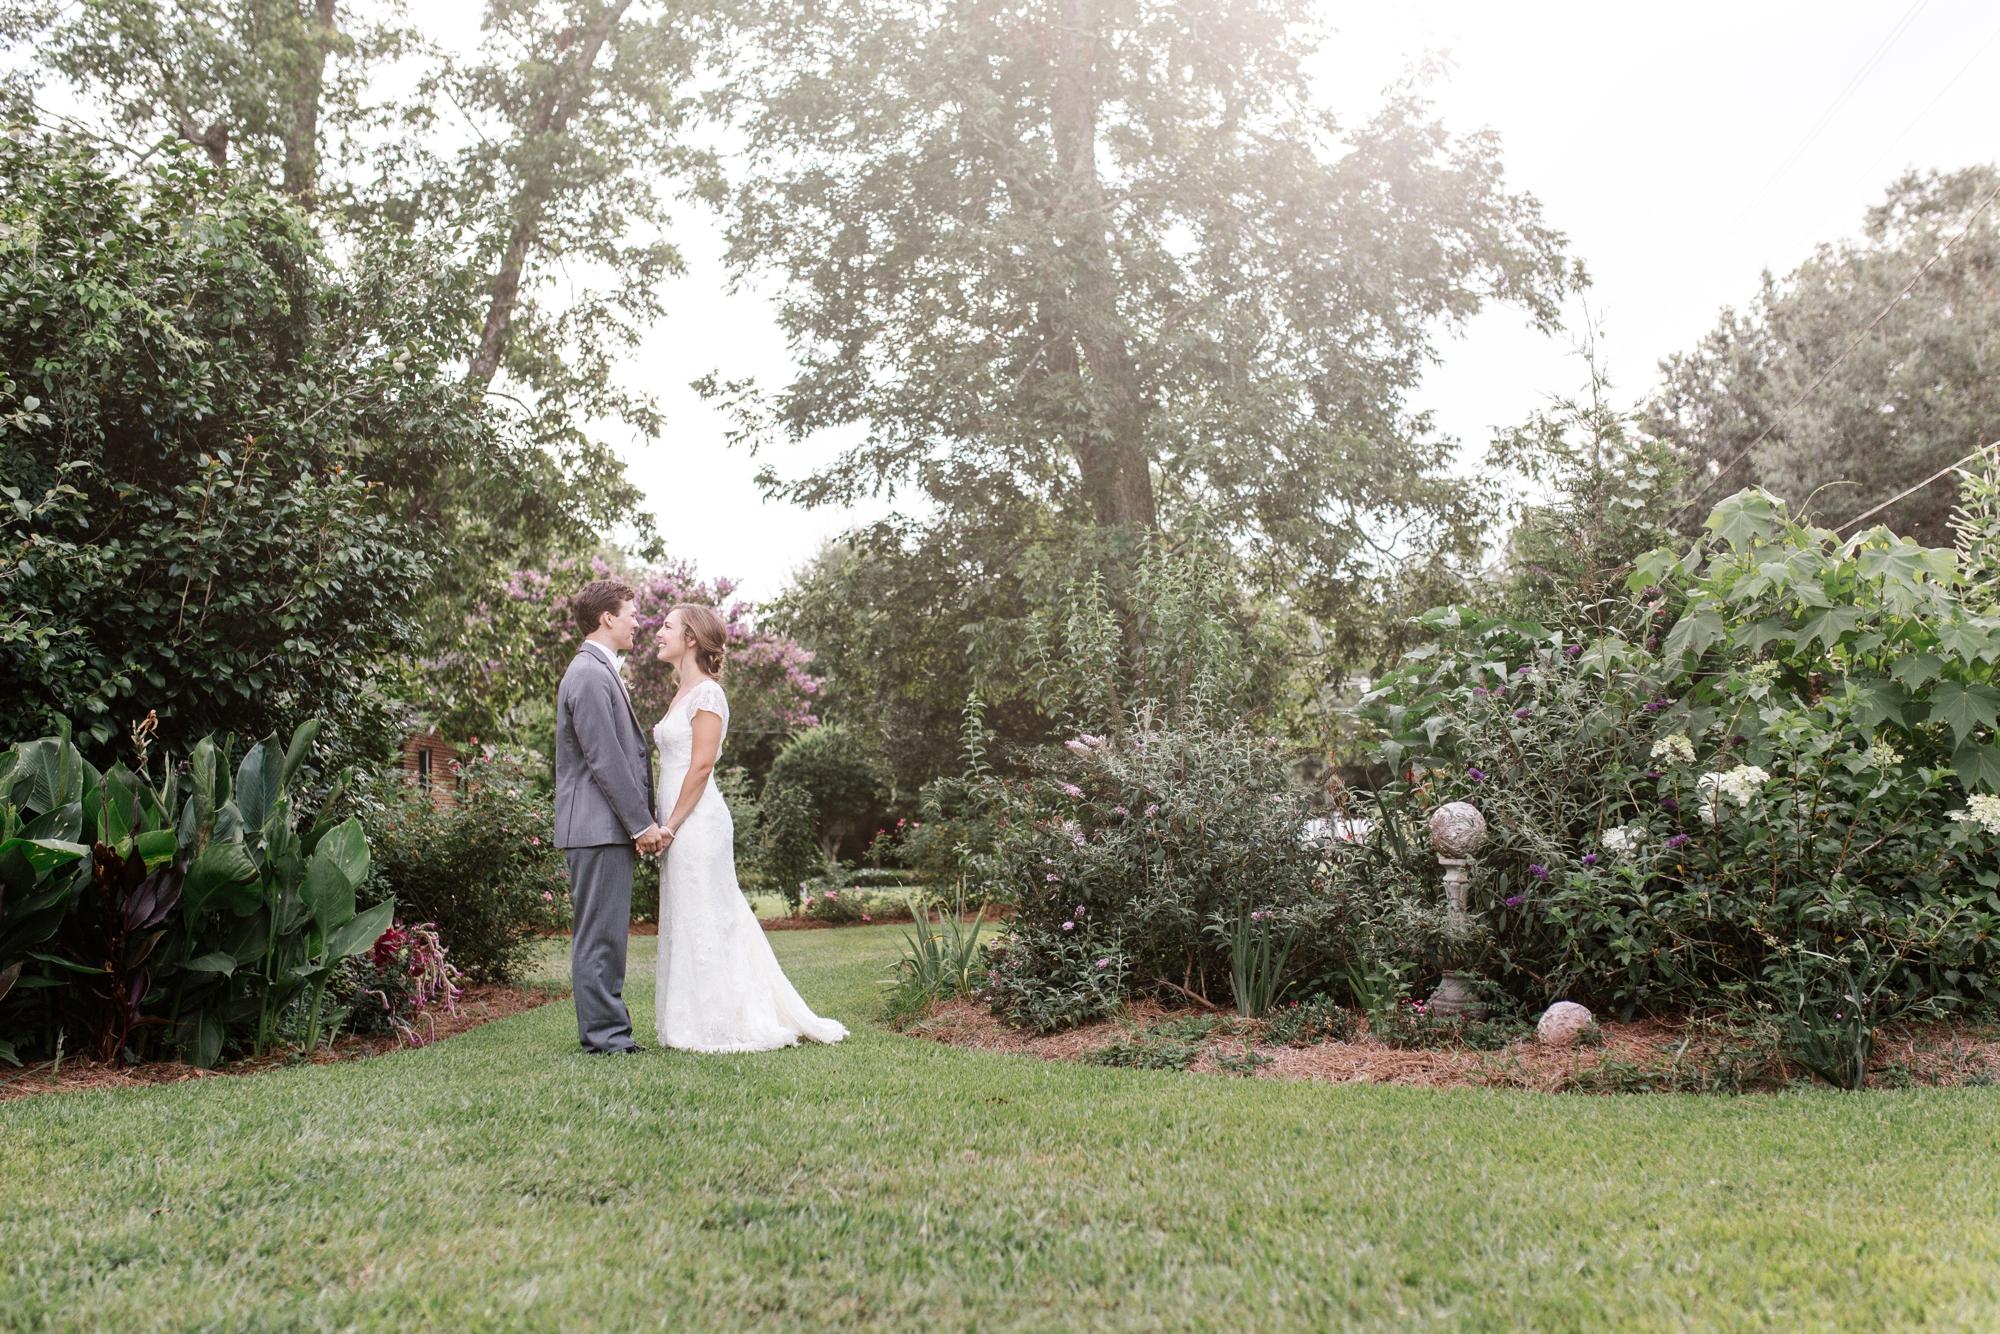 New_Orleans_Wedding_Photographer_1659.jpg